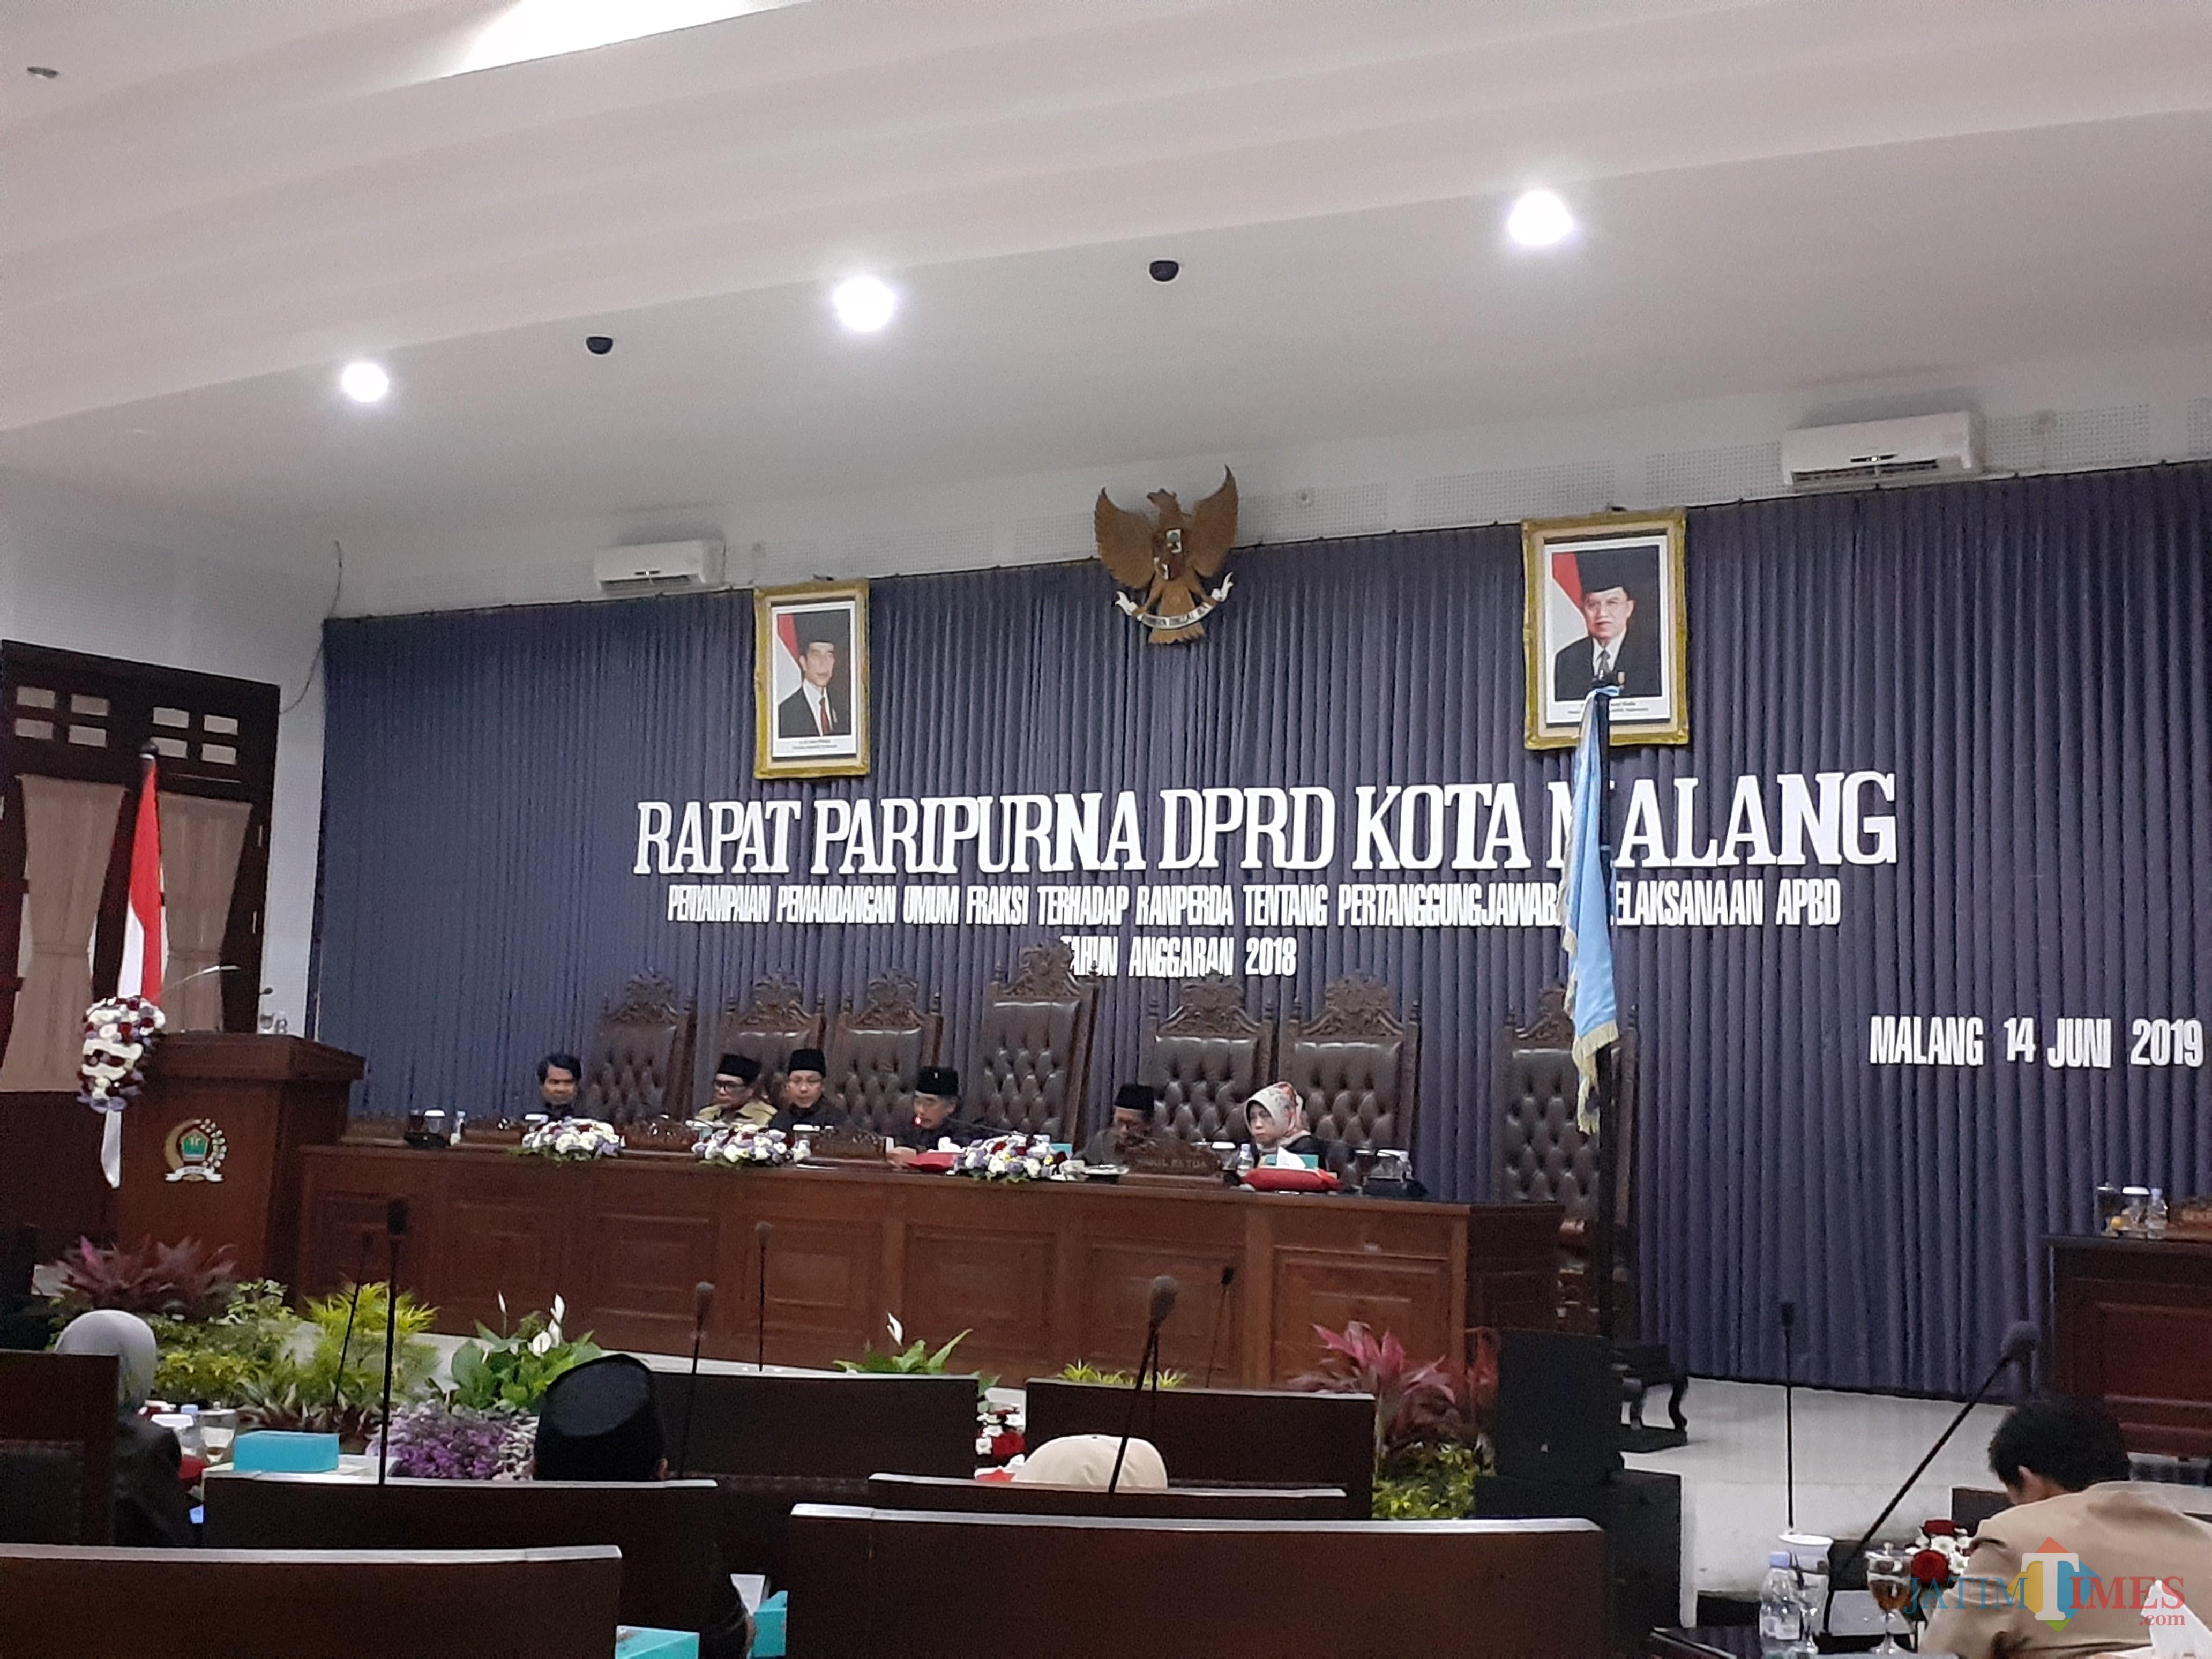 Suasana saat penyampaian pandangan fraksi dari anggota DPRD Kota Malang dalam Rapat Paripurna (Arifina Cahyanti Firdausi/MalangTIMES)